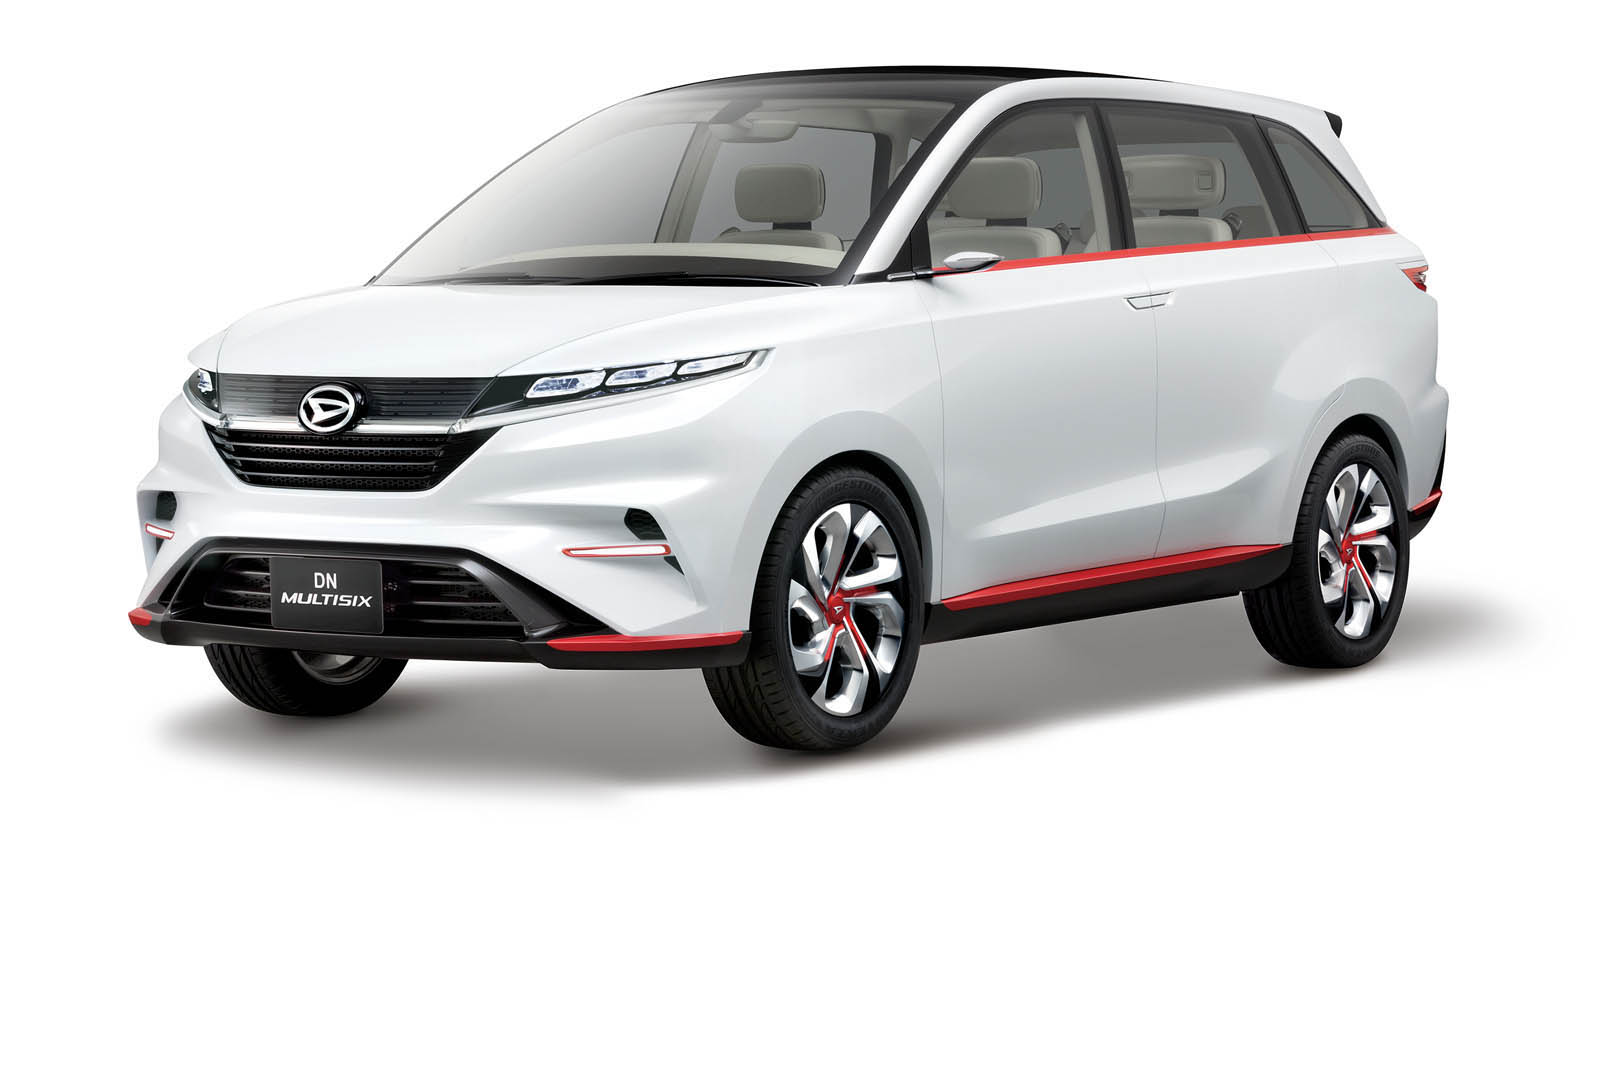 Daihatsu's Tokyo Concepts Blend Retro And Futuristic ...